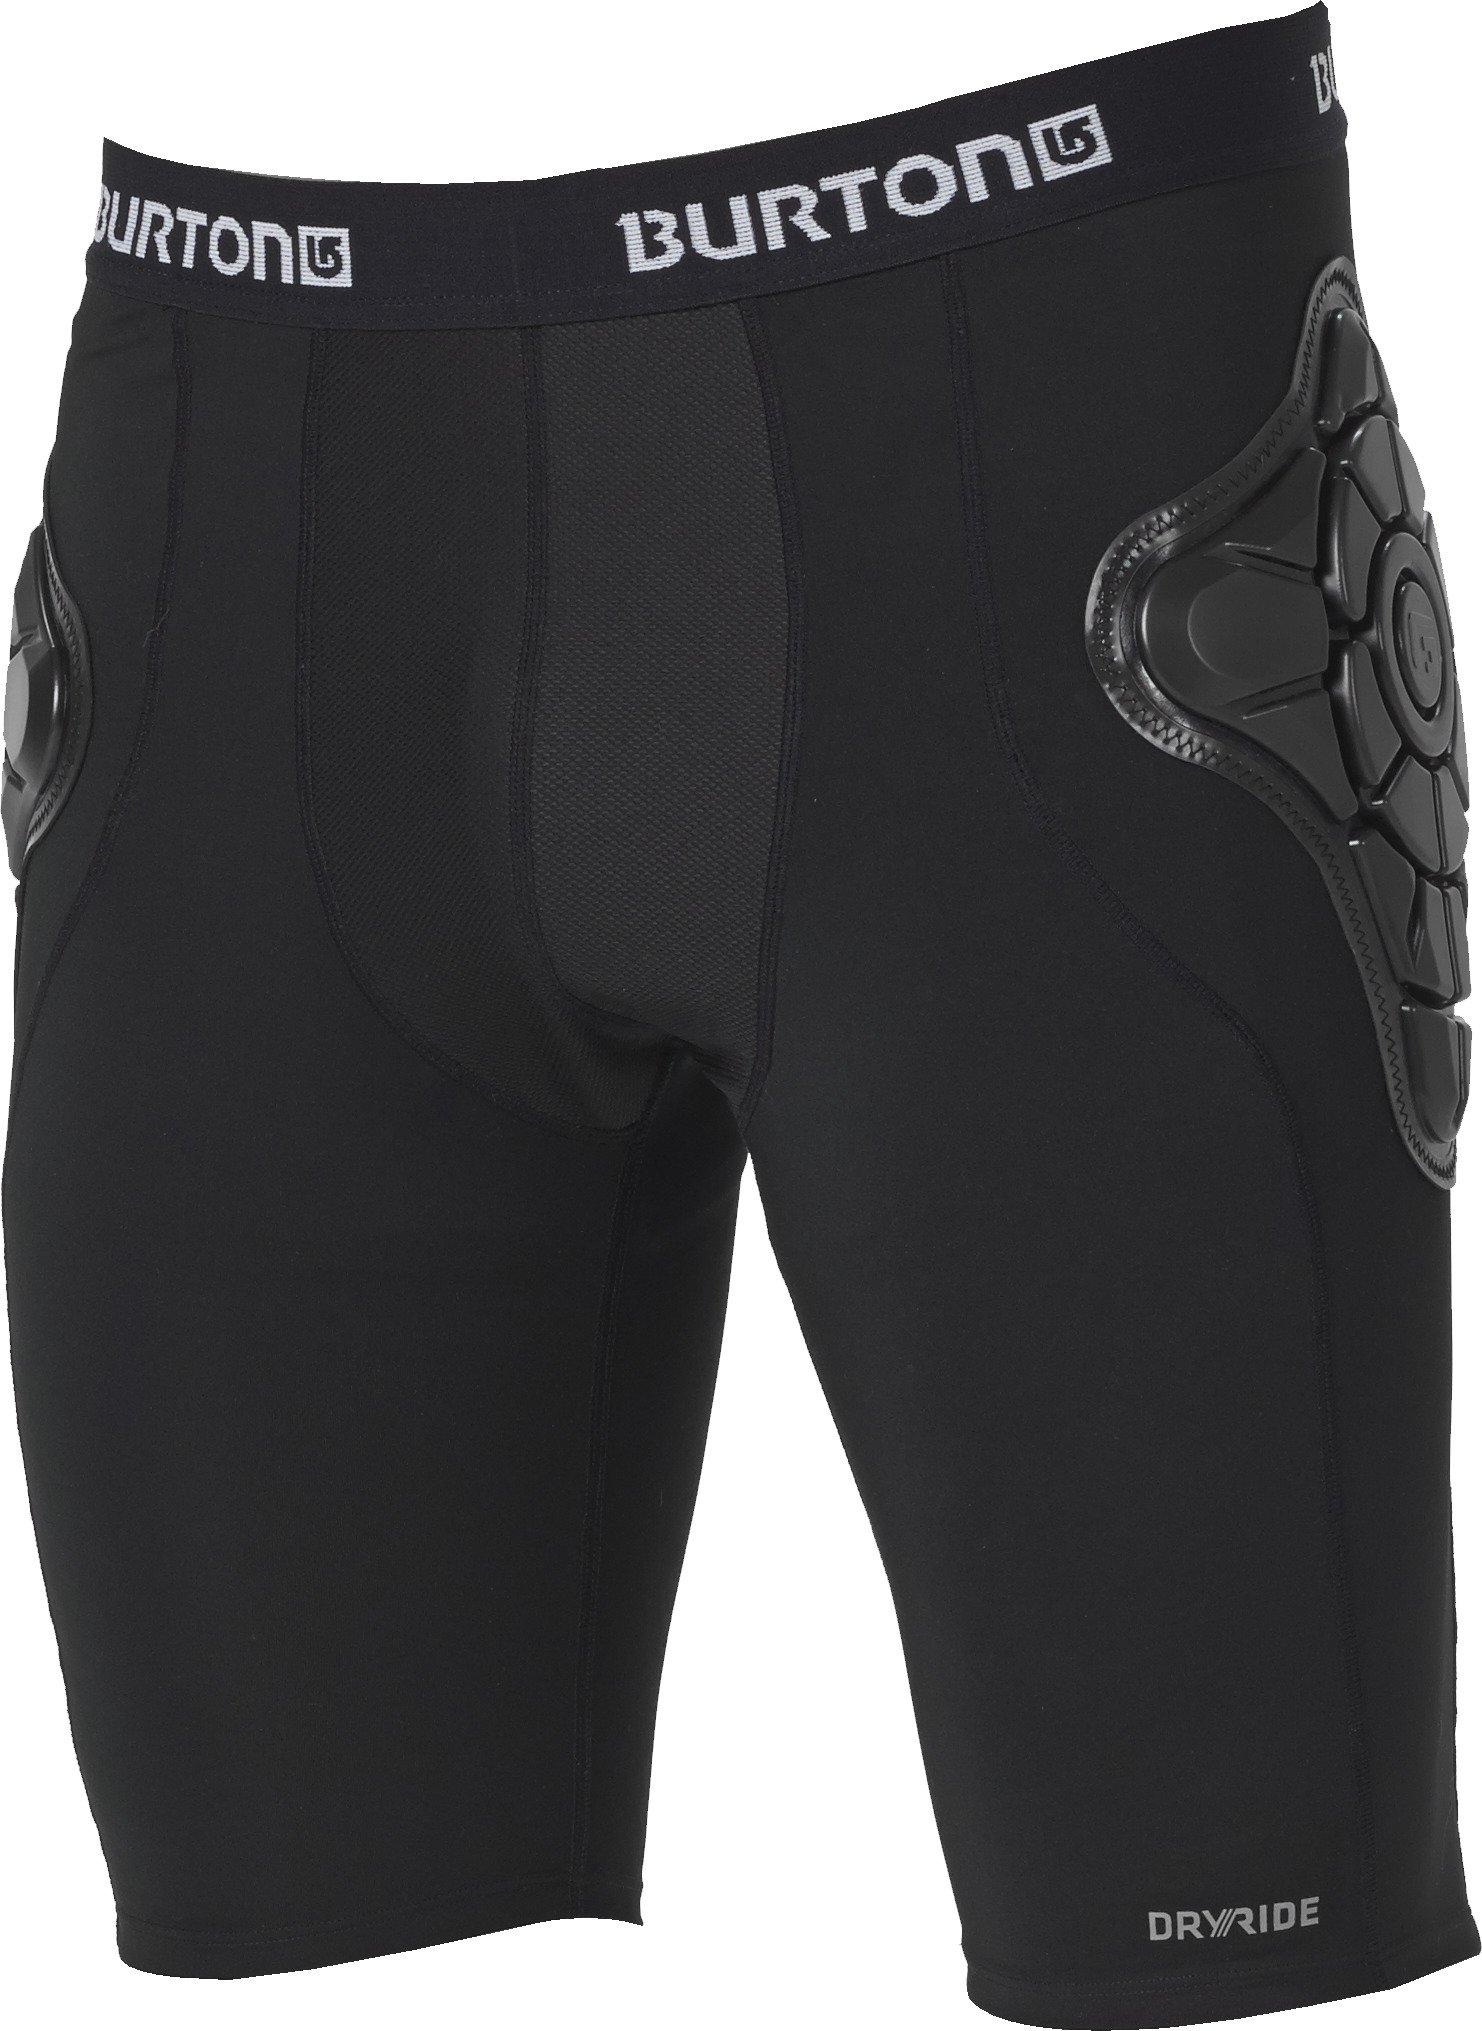 Burton Men's Total Impact Short, True Black, X-Large